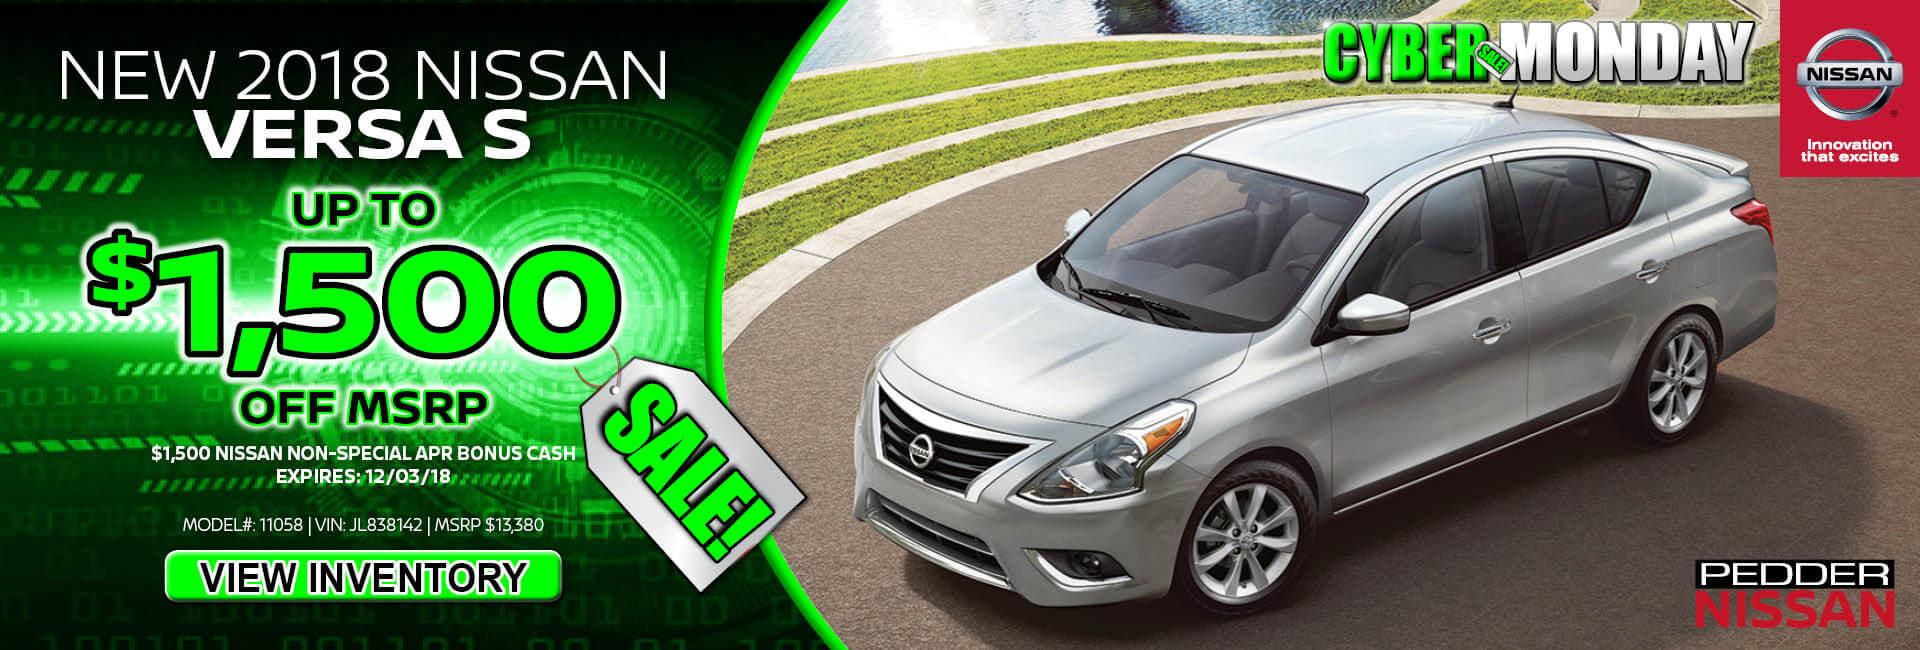 Nissan Versa $1,500 off MSRP